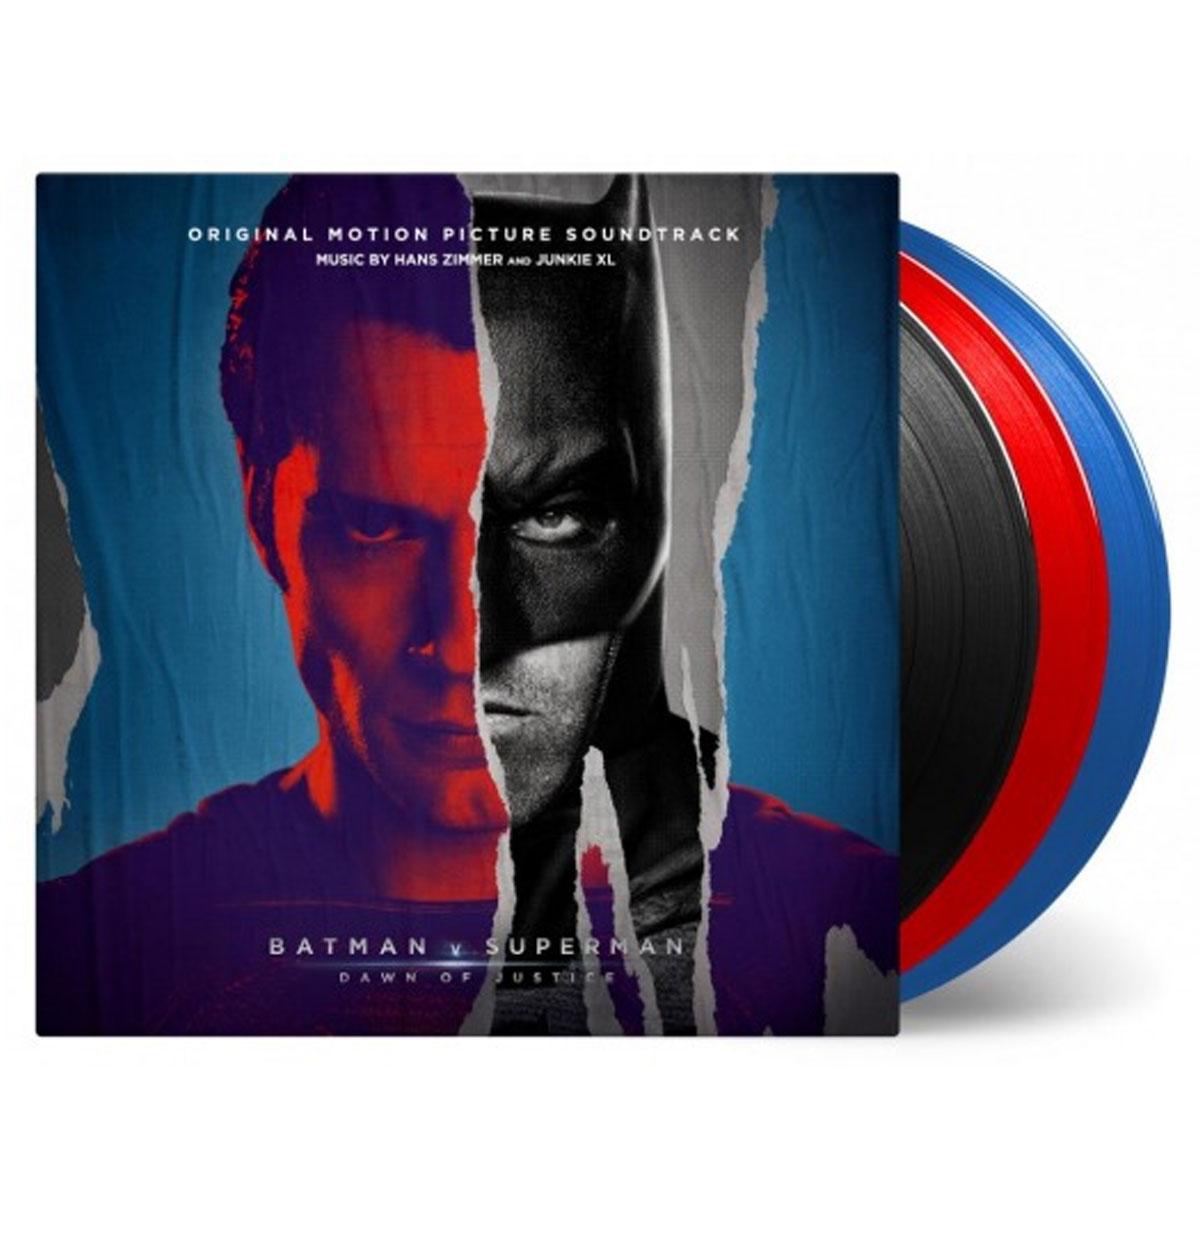 OST - Batman V Superman: Dawn of Justice 3LP Beperkte Oplage